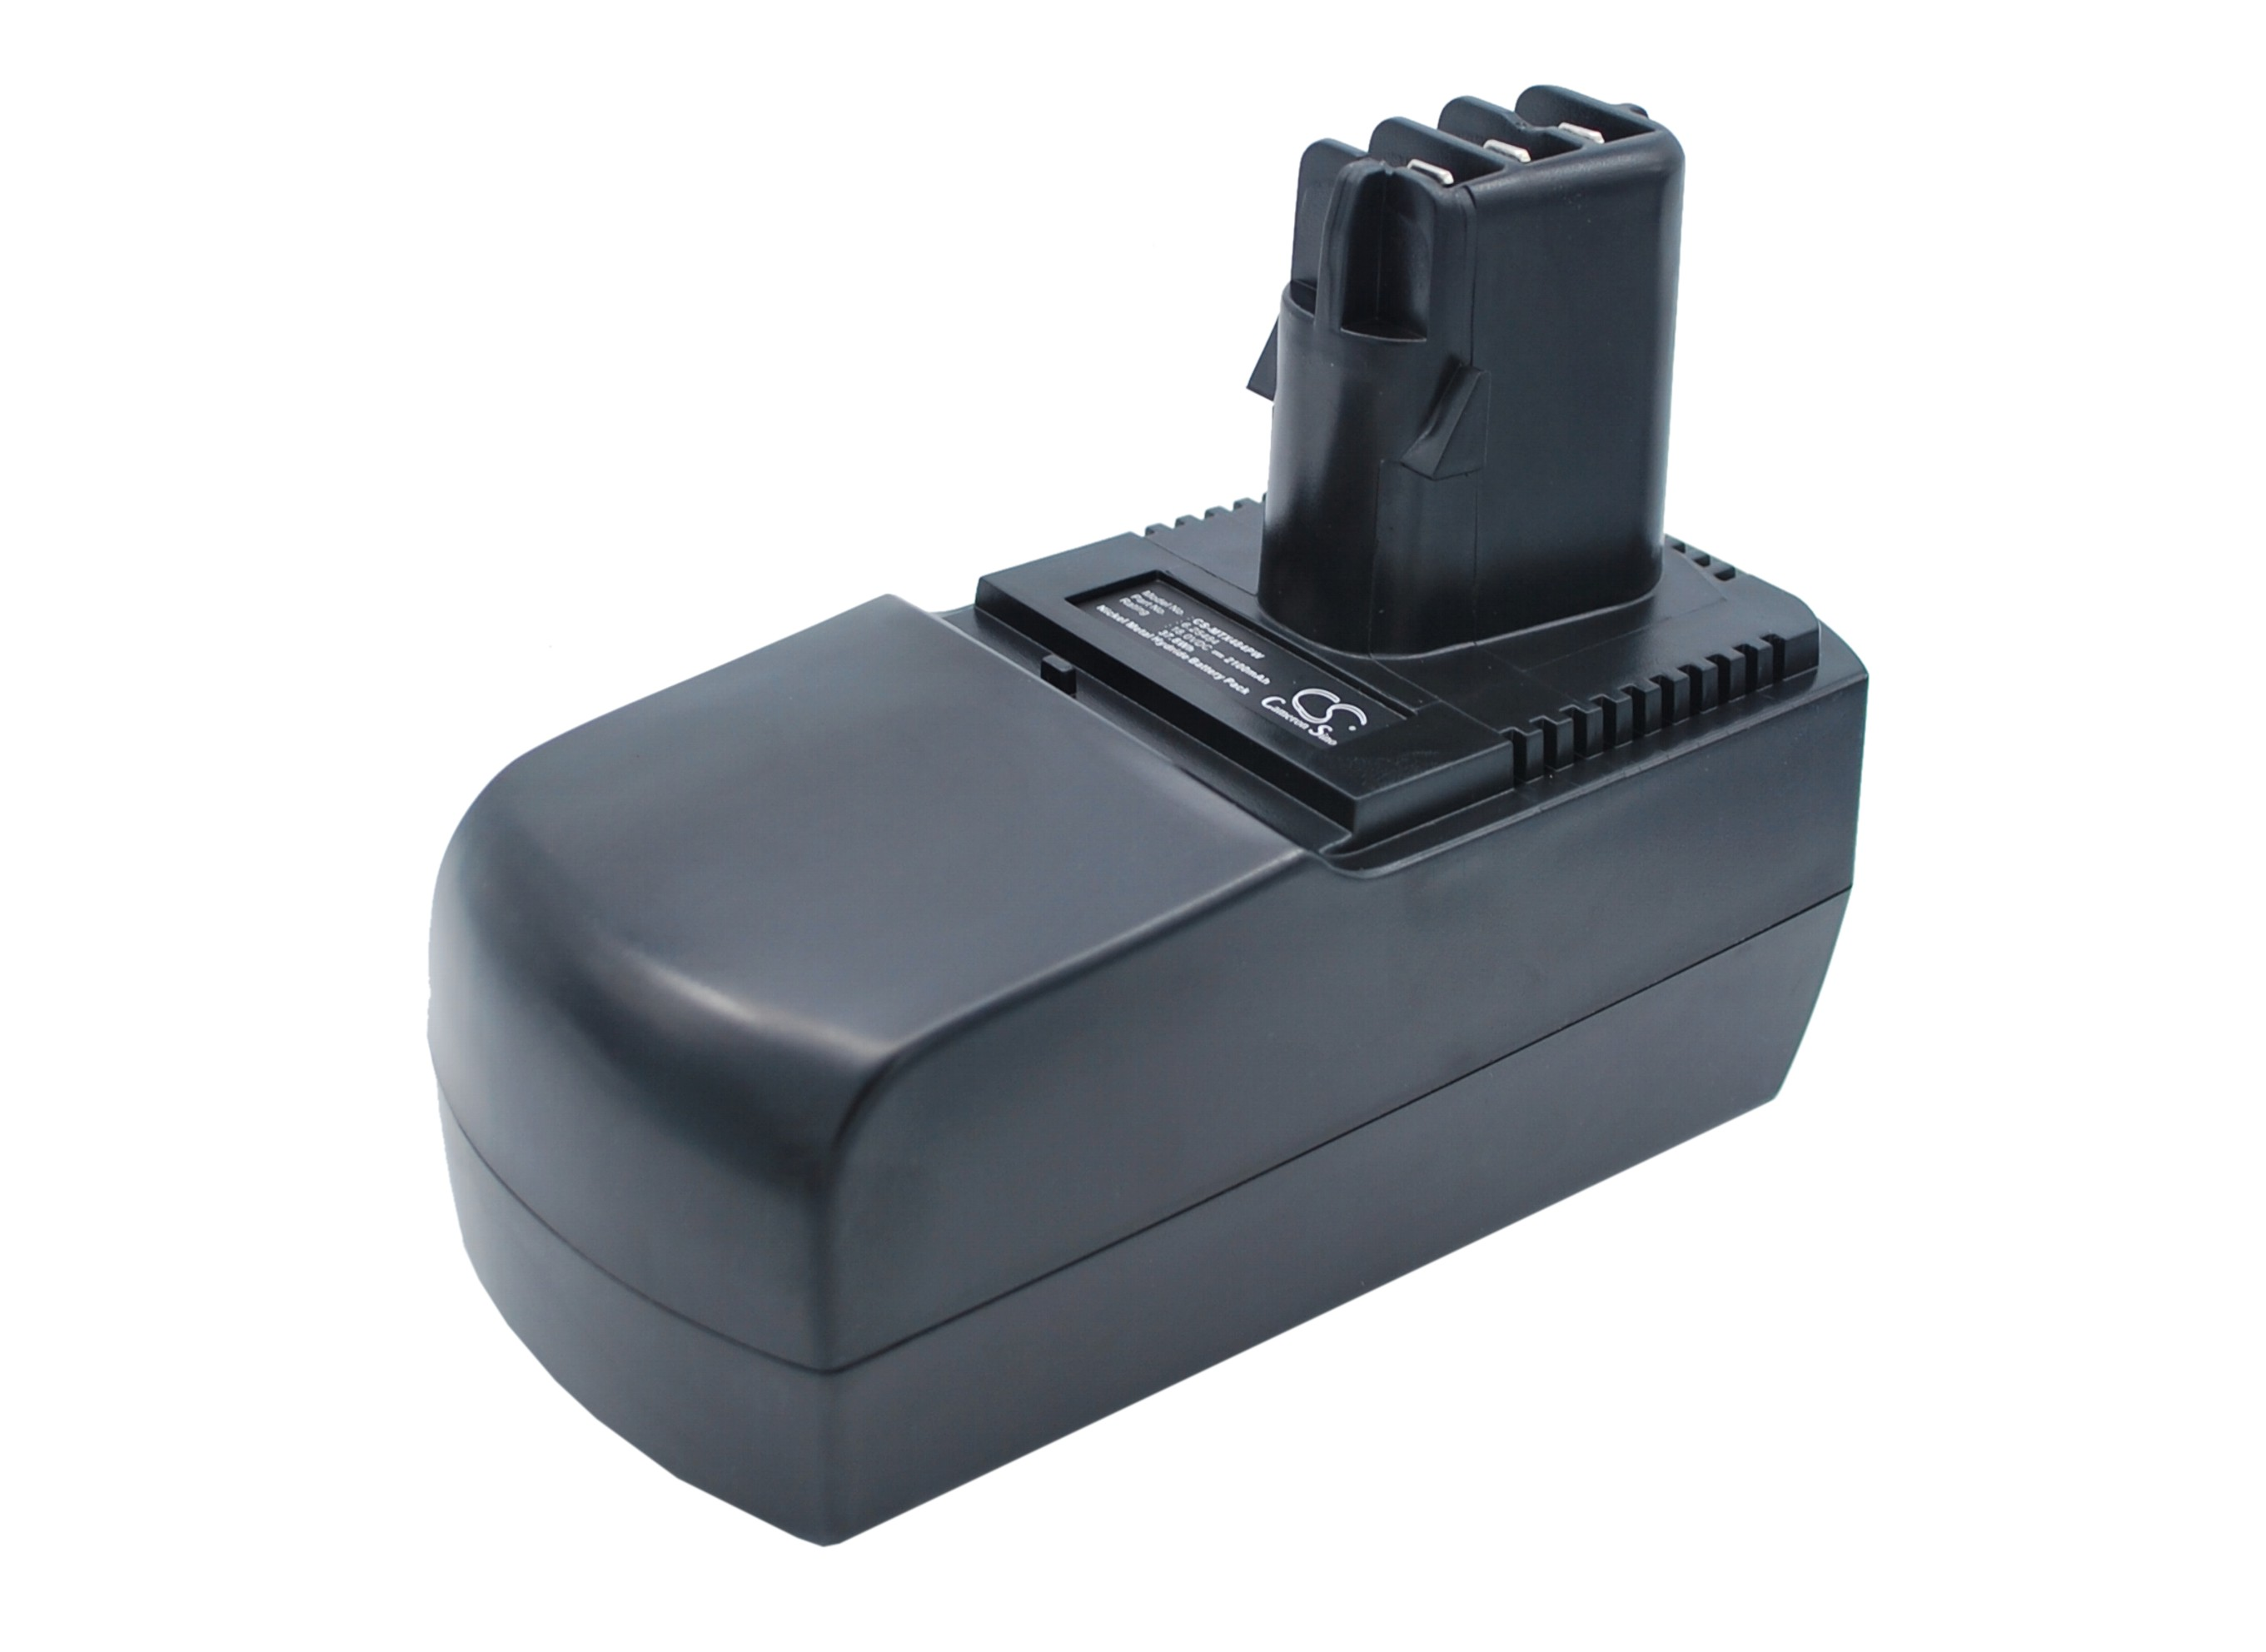 Cameron Sino baterie do nářadí pro METABO BSZ 18 Impuls 18V Ni-MH 2100mAh černá - neoriginální